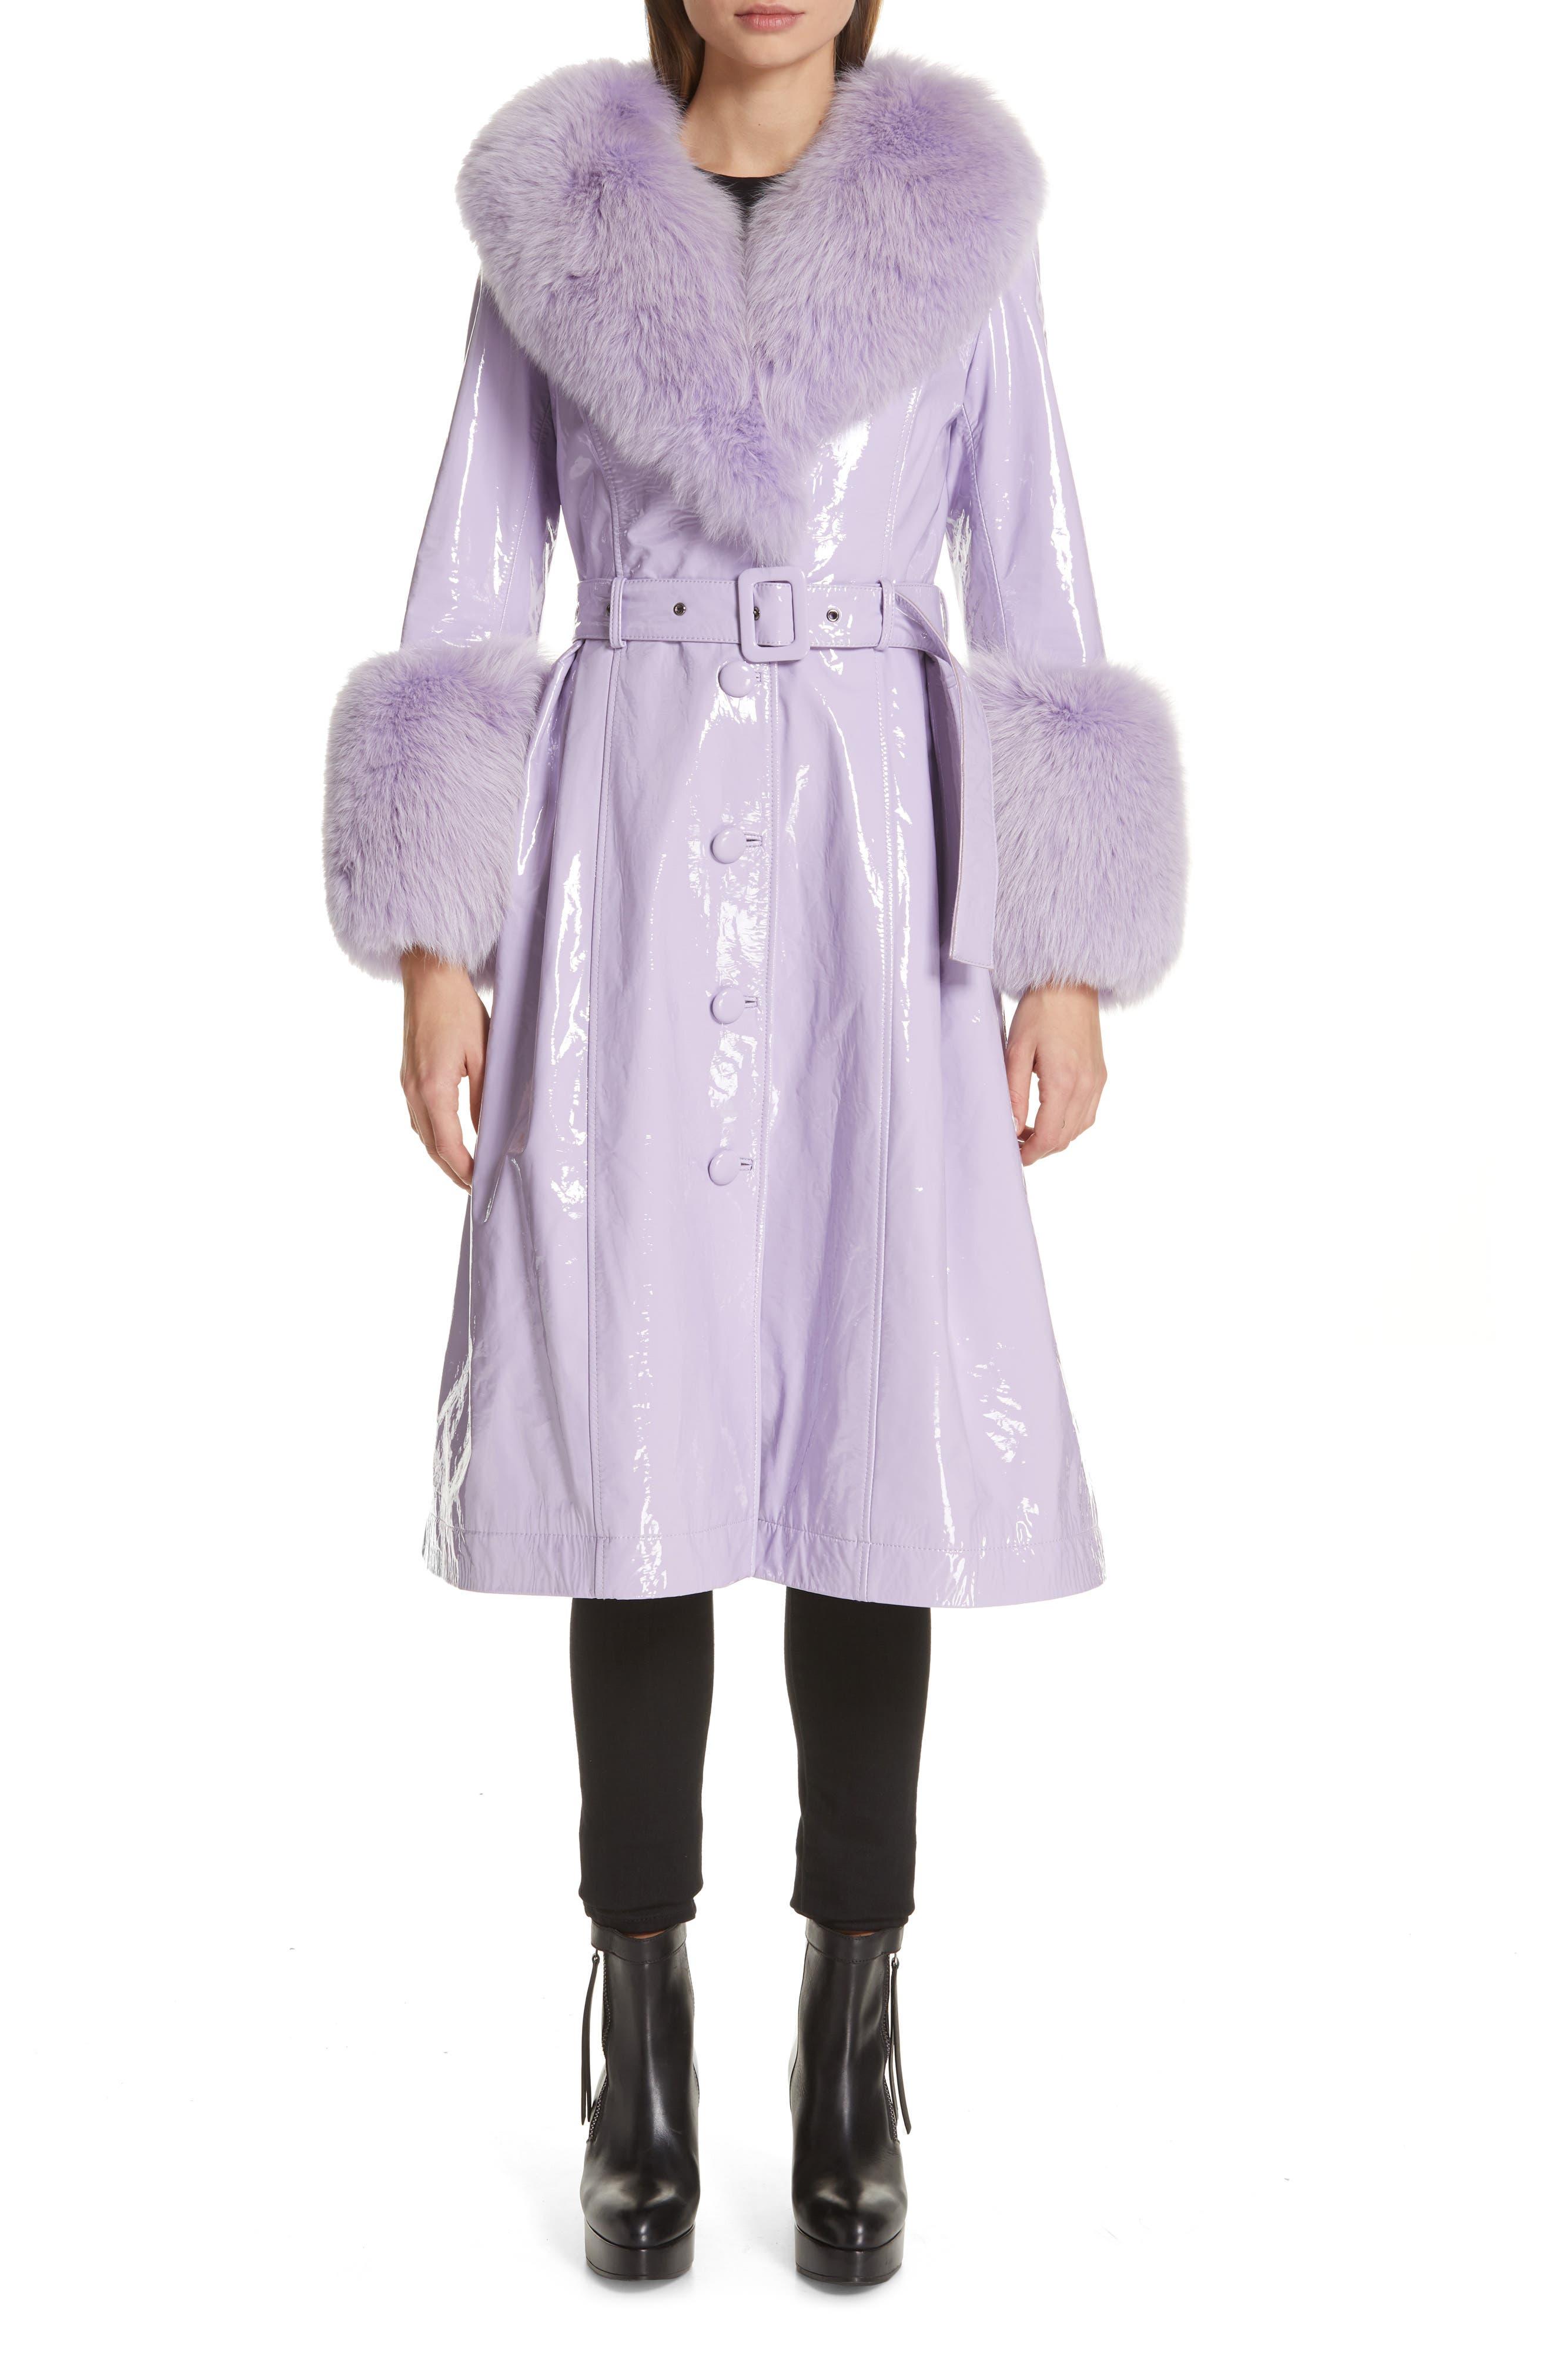 SAKS POTTS Patent Leather Coat with Genuine Fox Fur Trim, Main, color, LAVENDER